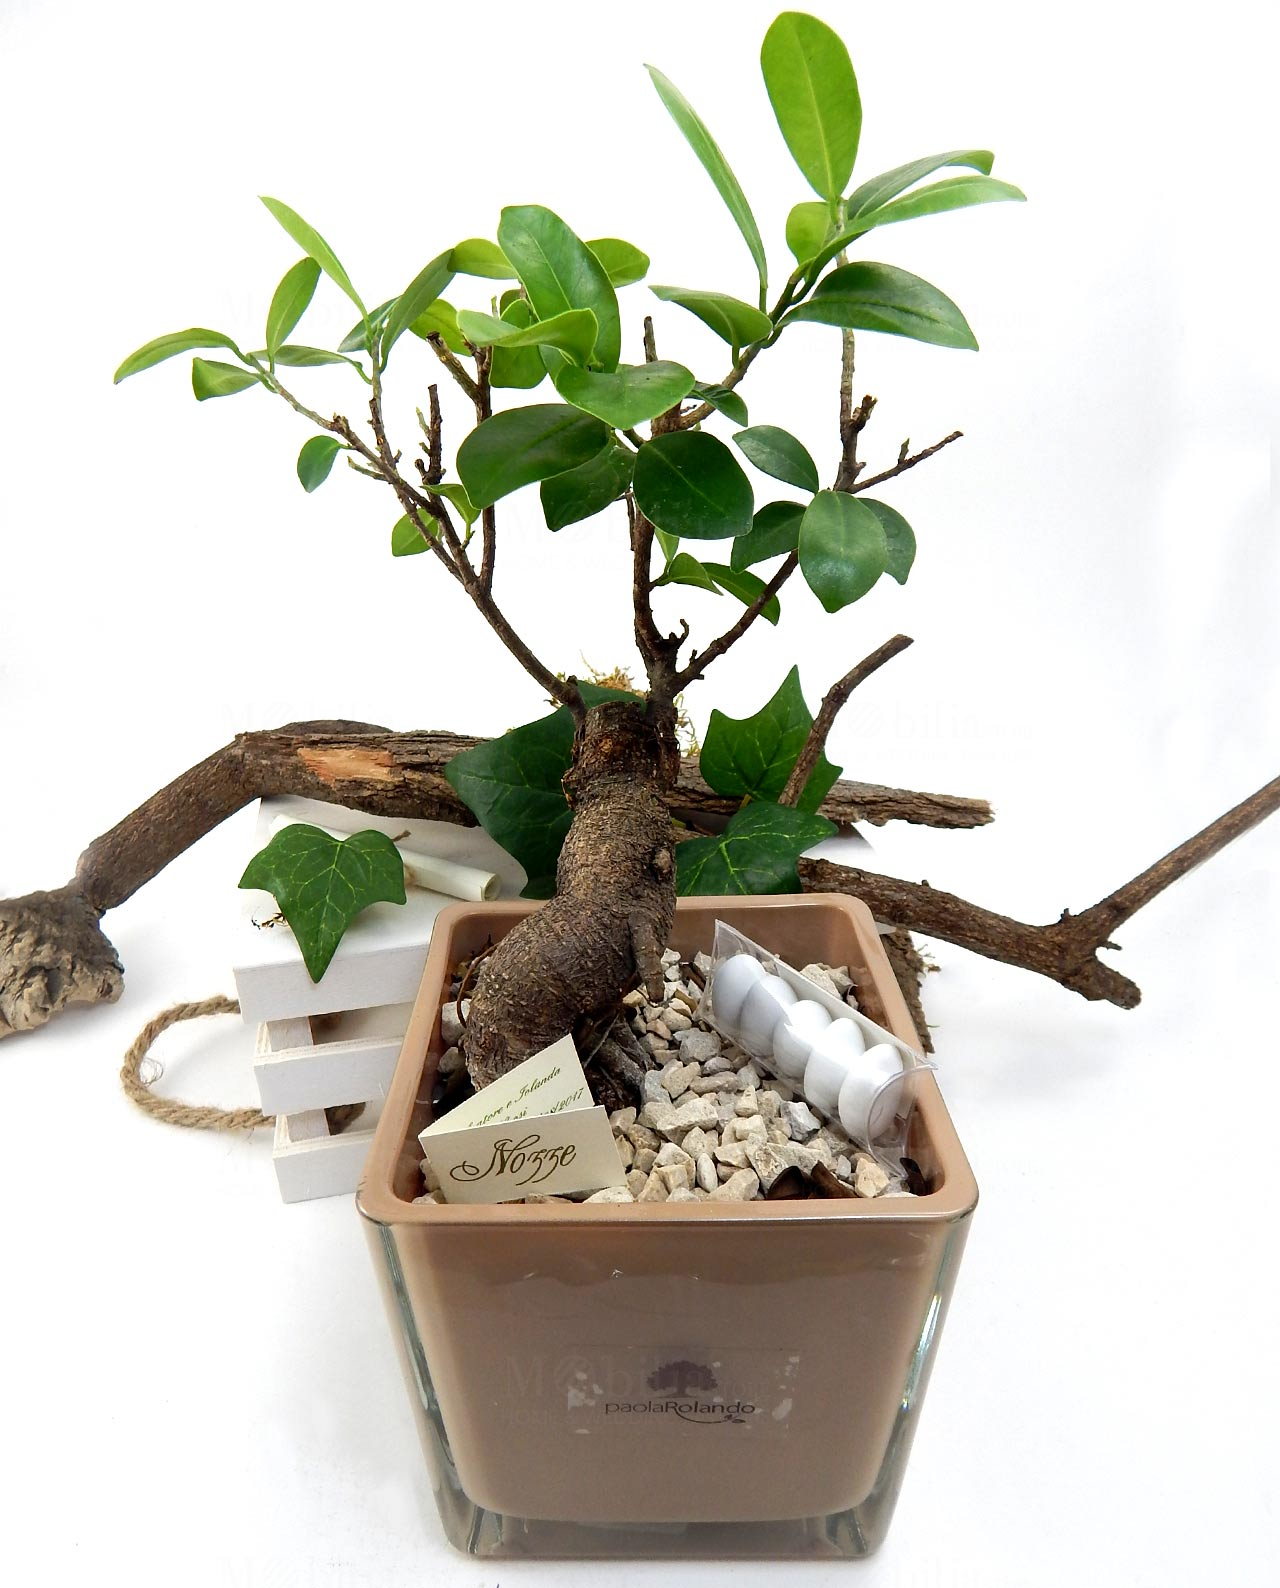 bomboniera bonsai ginseng con vaso in vetro nocciola paola